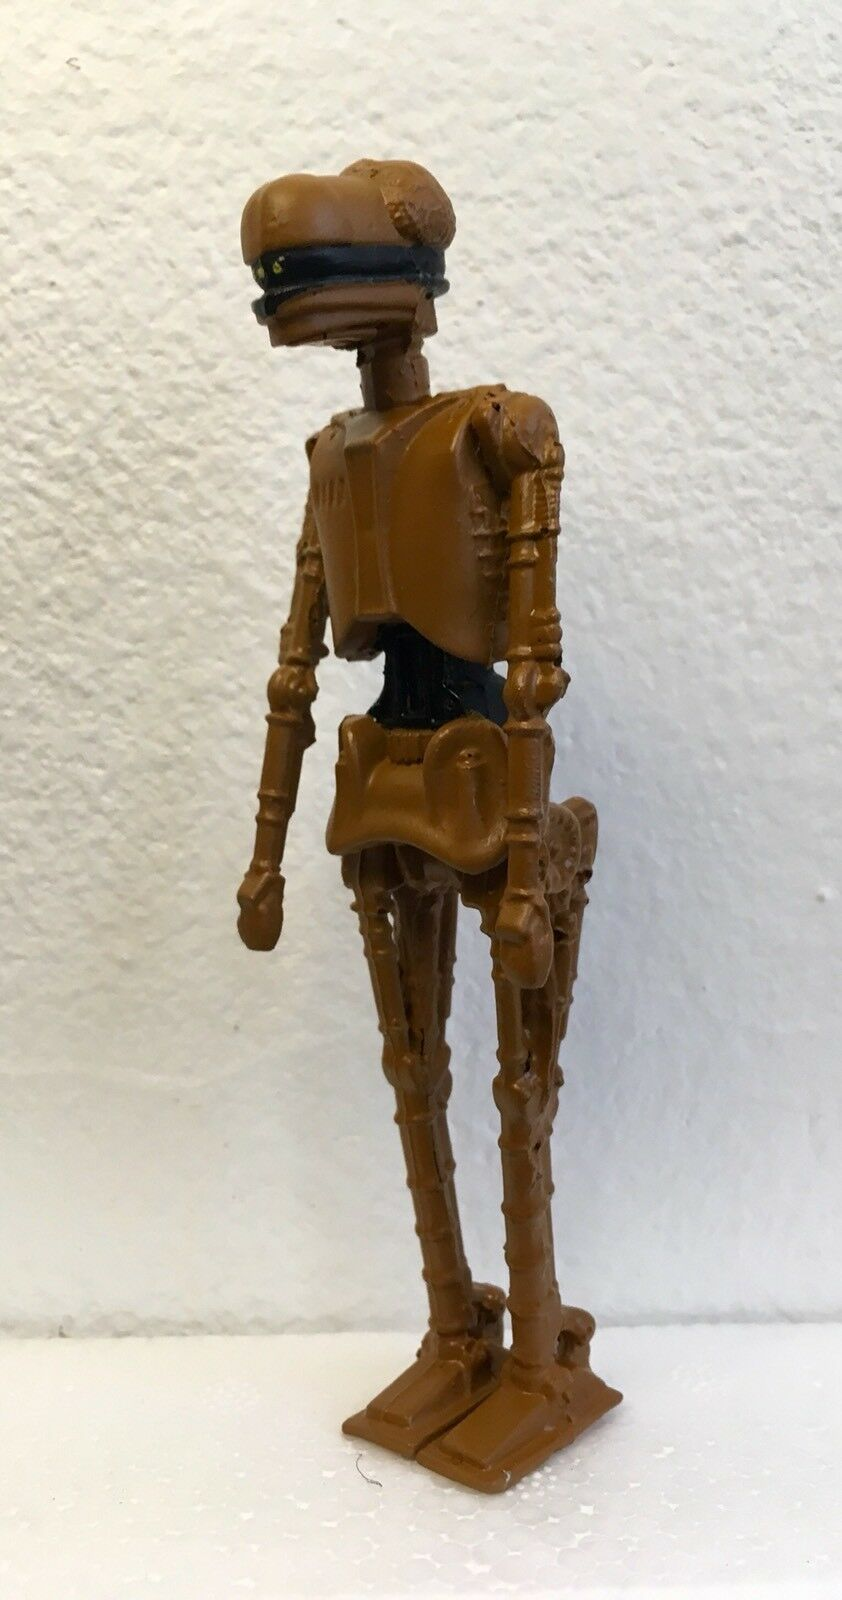 Star Wars Vintage Style  EV-9D9 figure    Repro Figure Star Wars, Recasting 273731